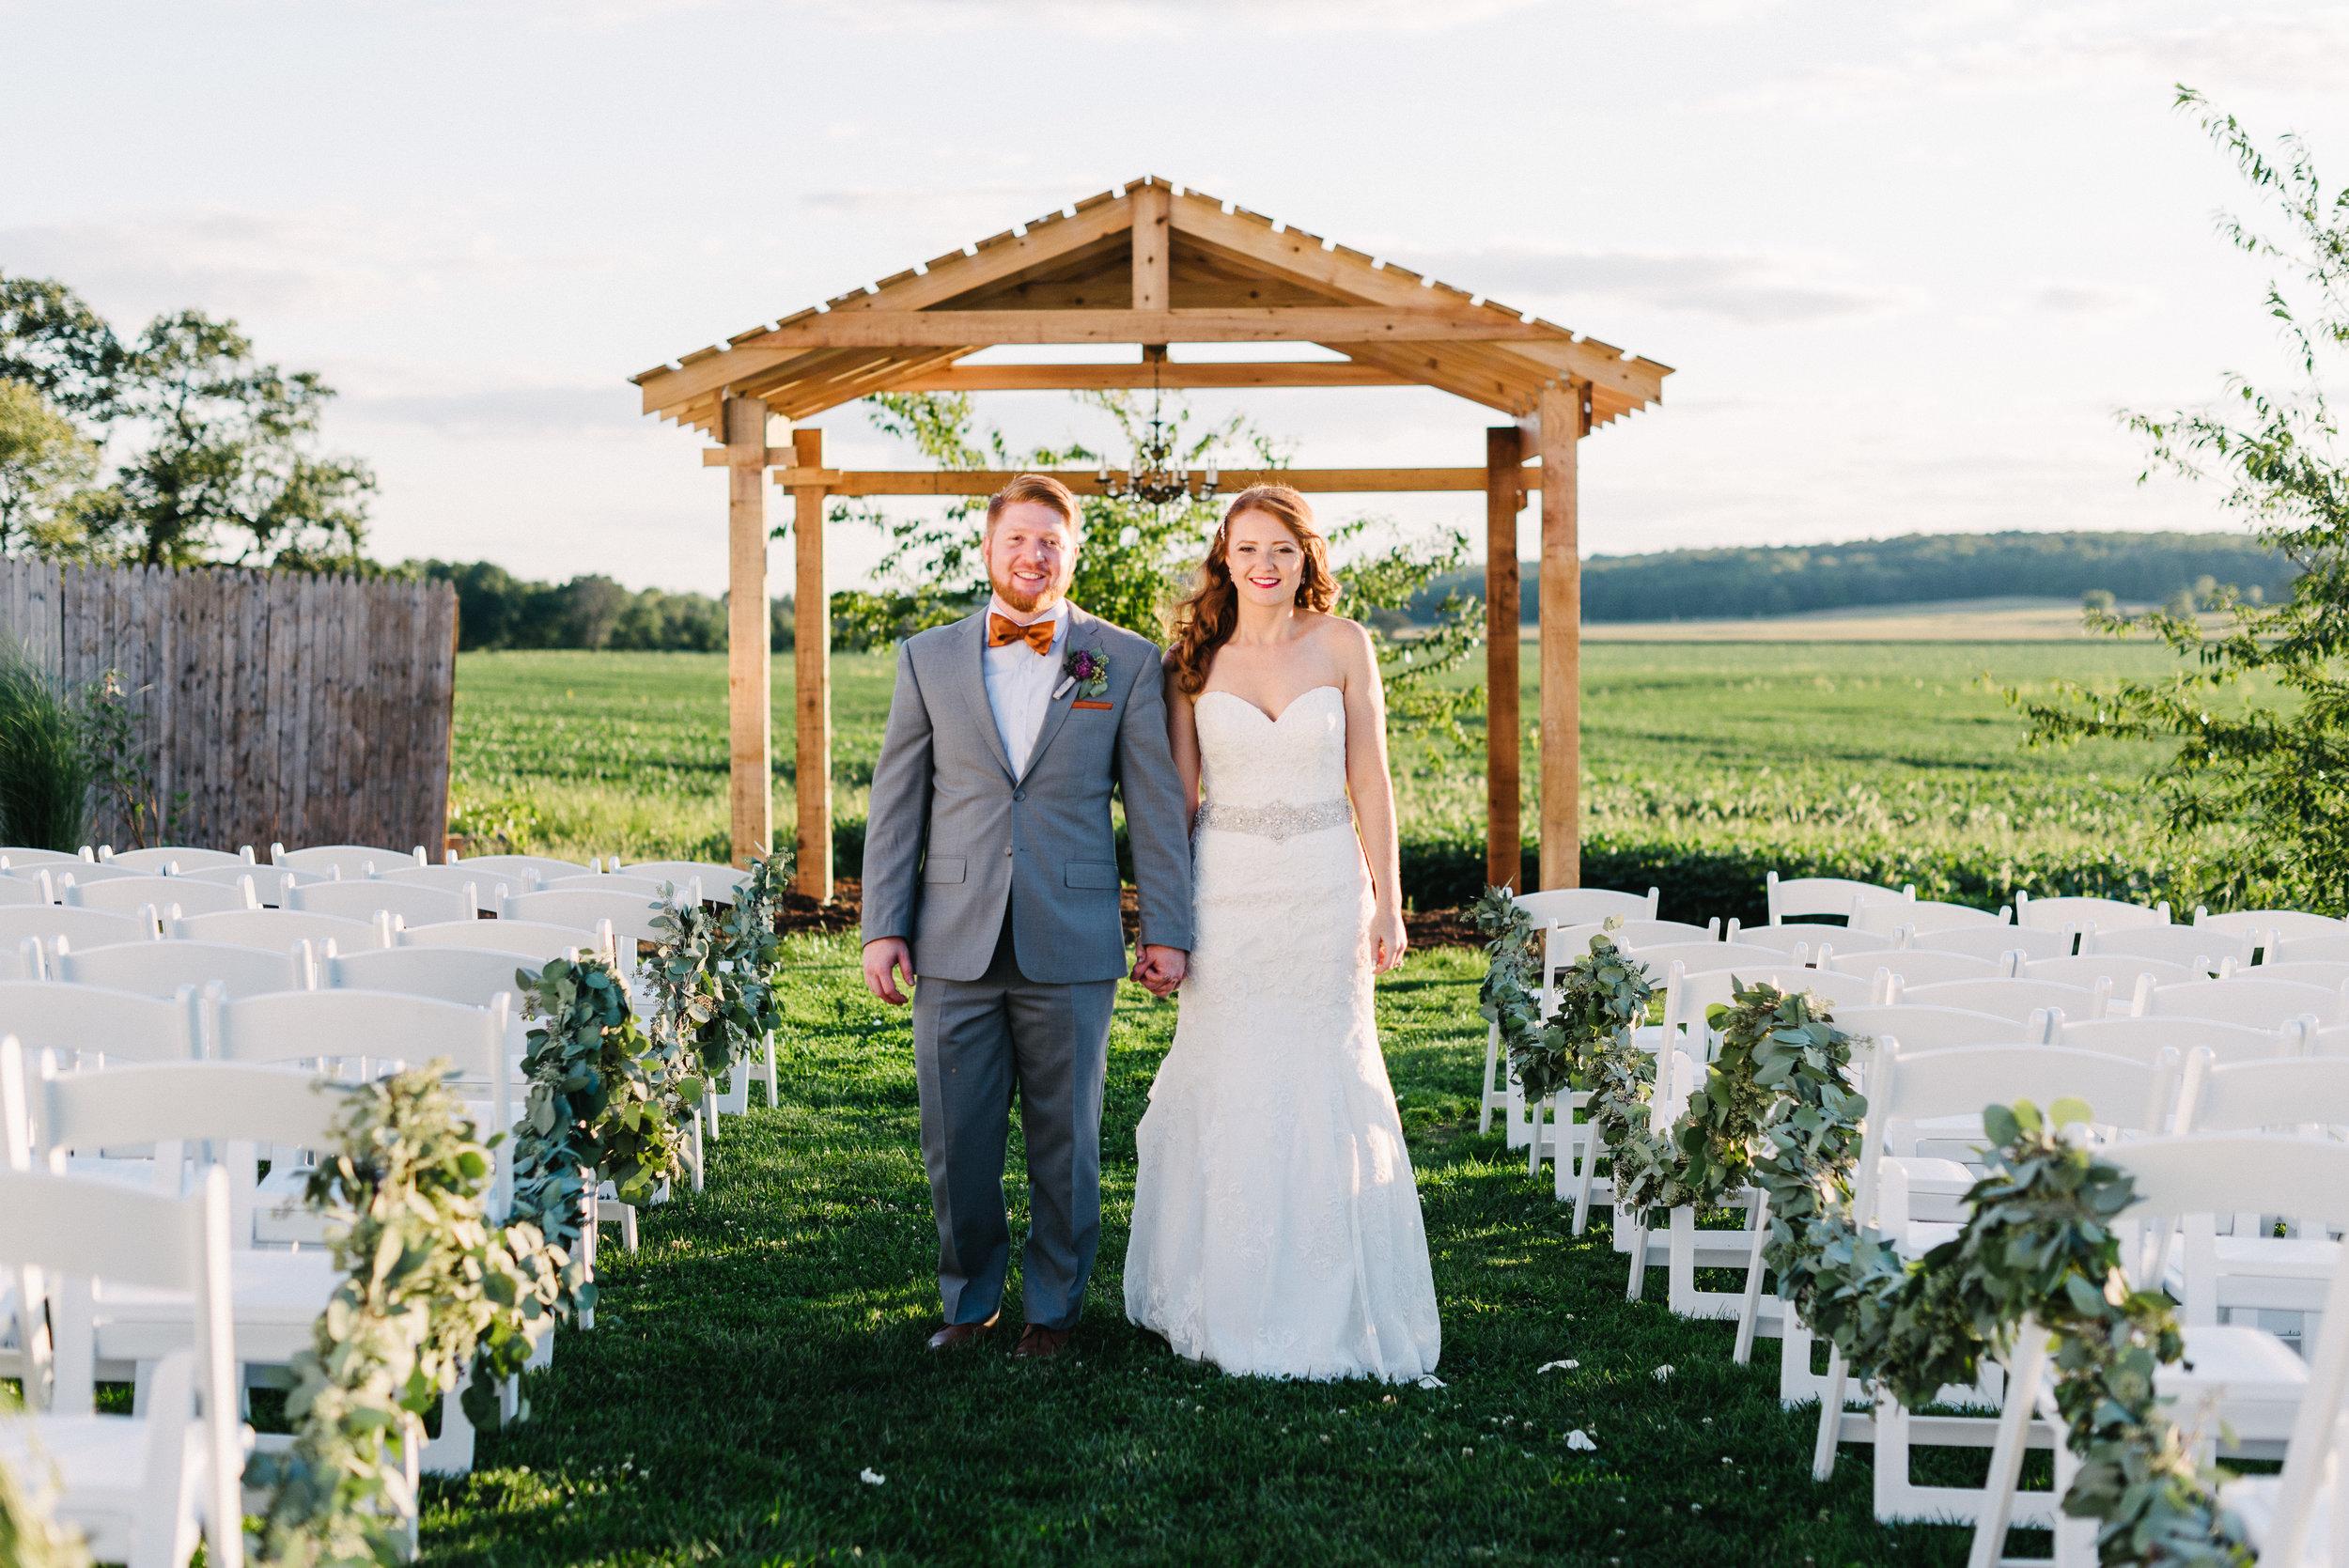 stephanie-cody-wedding_TSP-183206-2.jpg